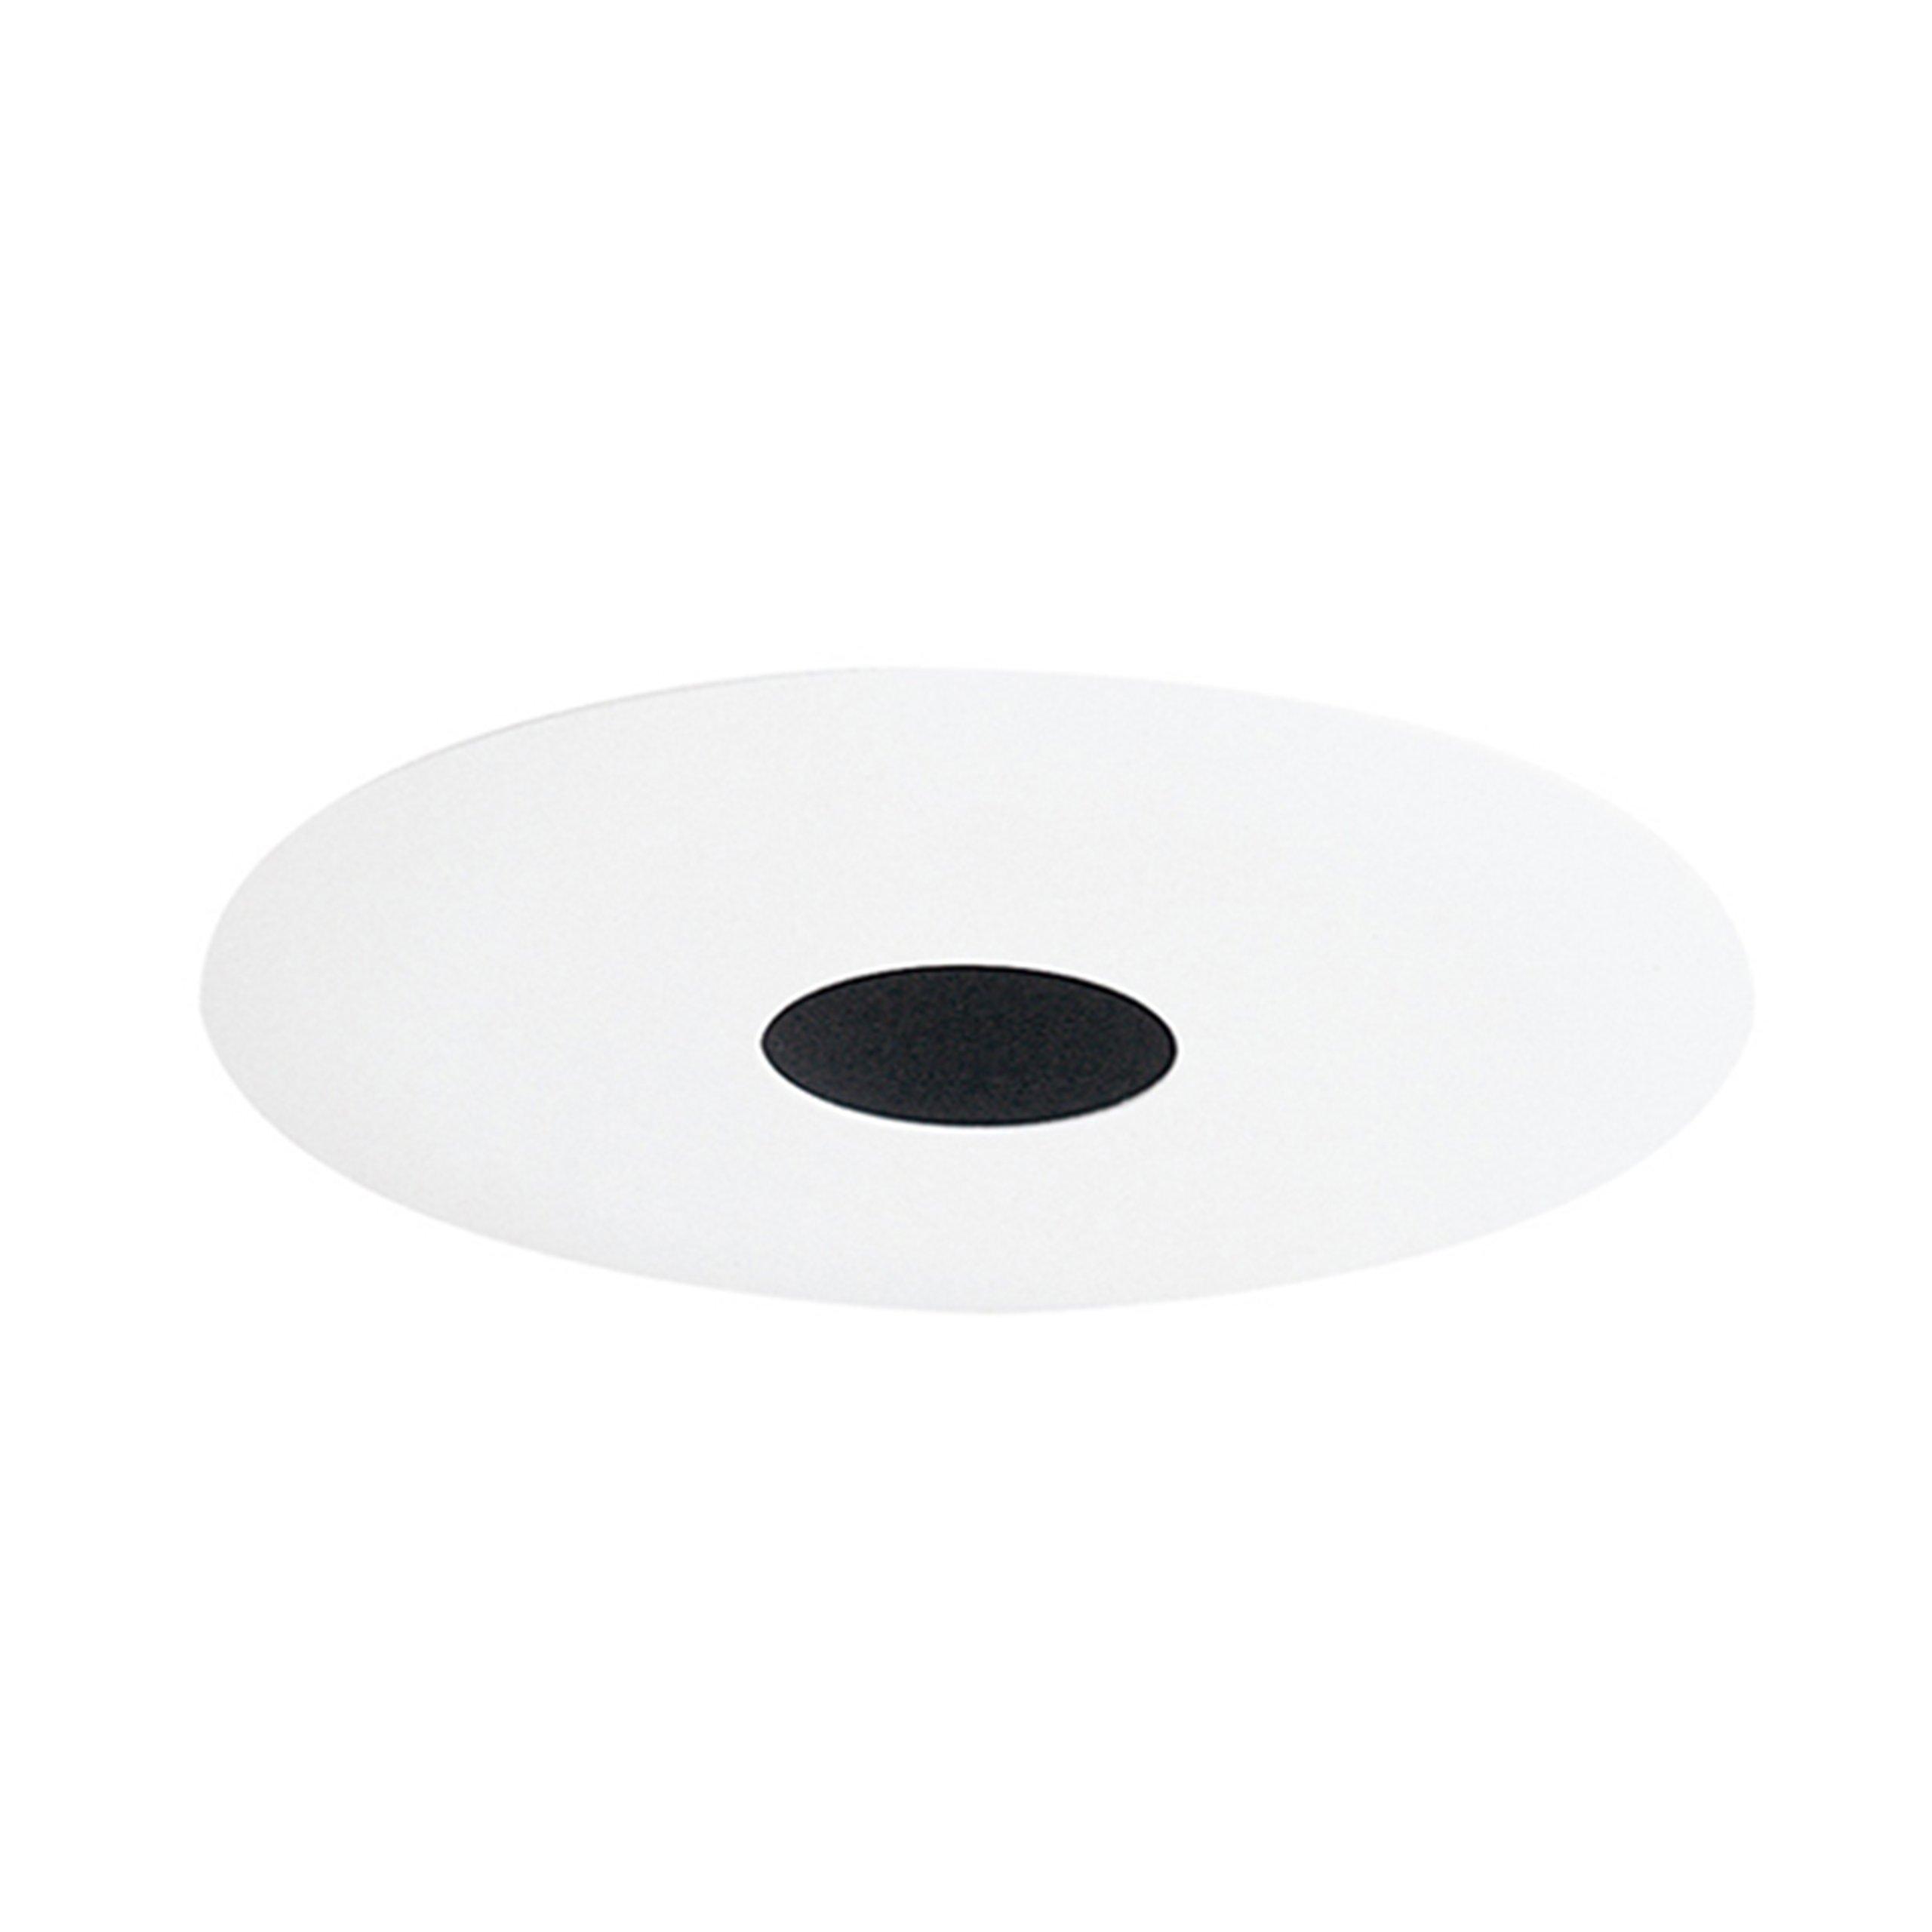 Juno Lighting 443B-WH 4-Inch Pinhole Recessed Trim, Black Baffle with White Trim